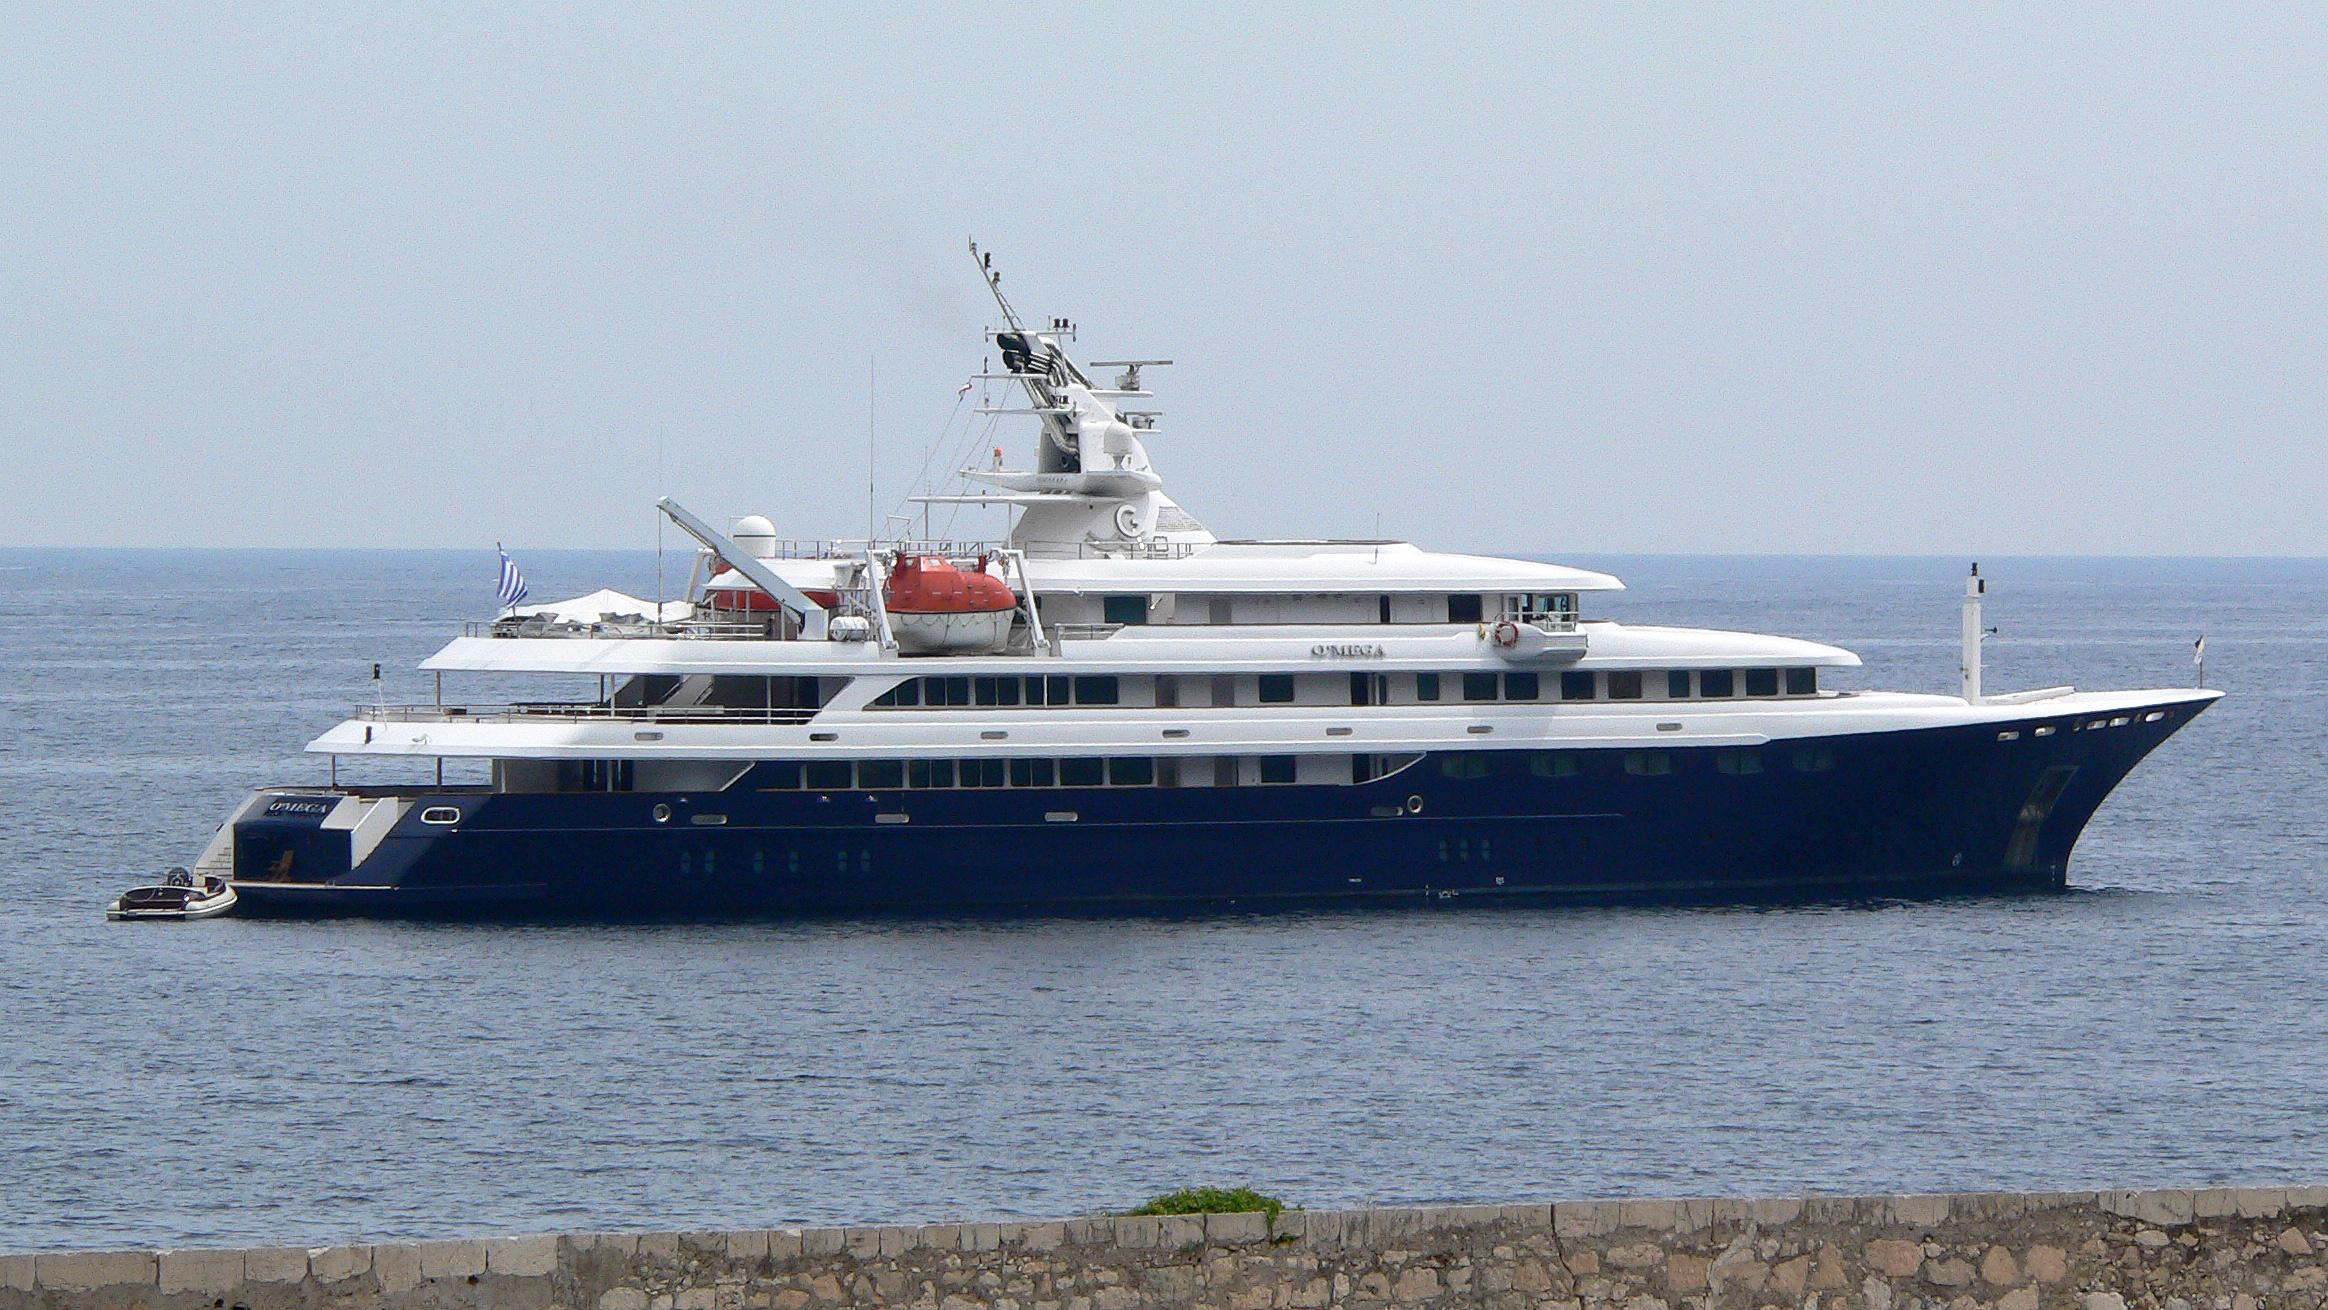 o-mega-motor-yacht-mitsubishi-hi-1985-82m-before-refit